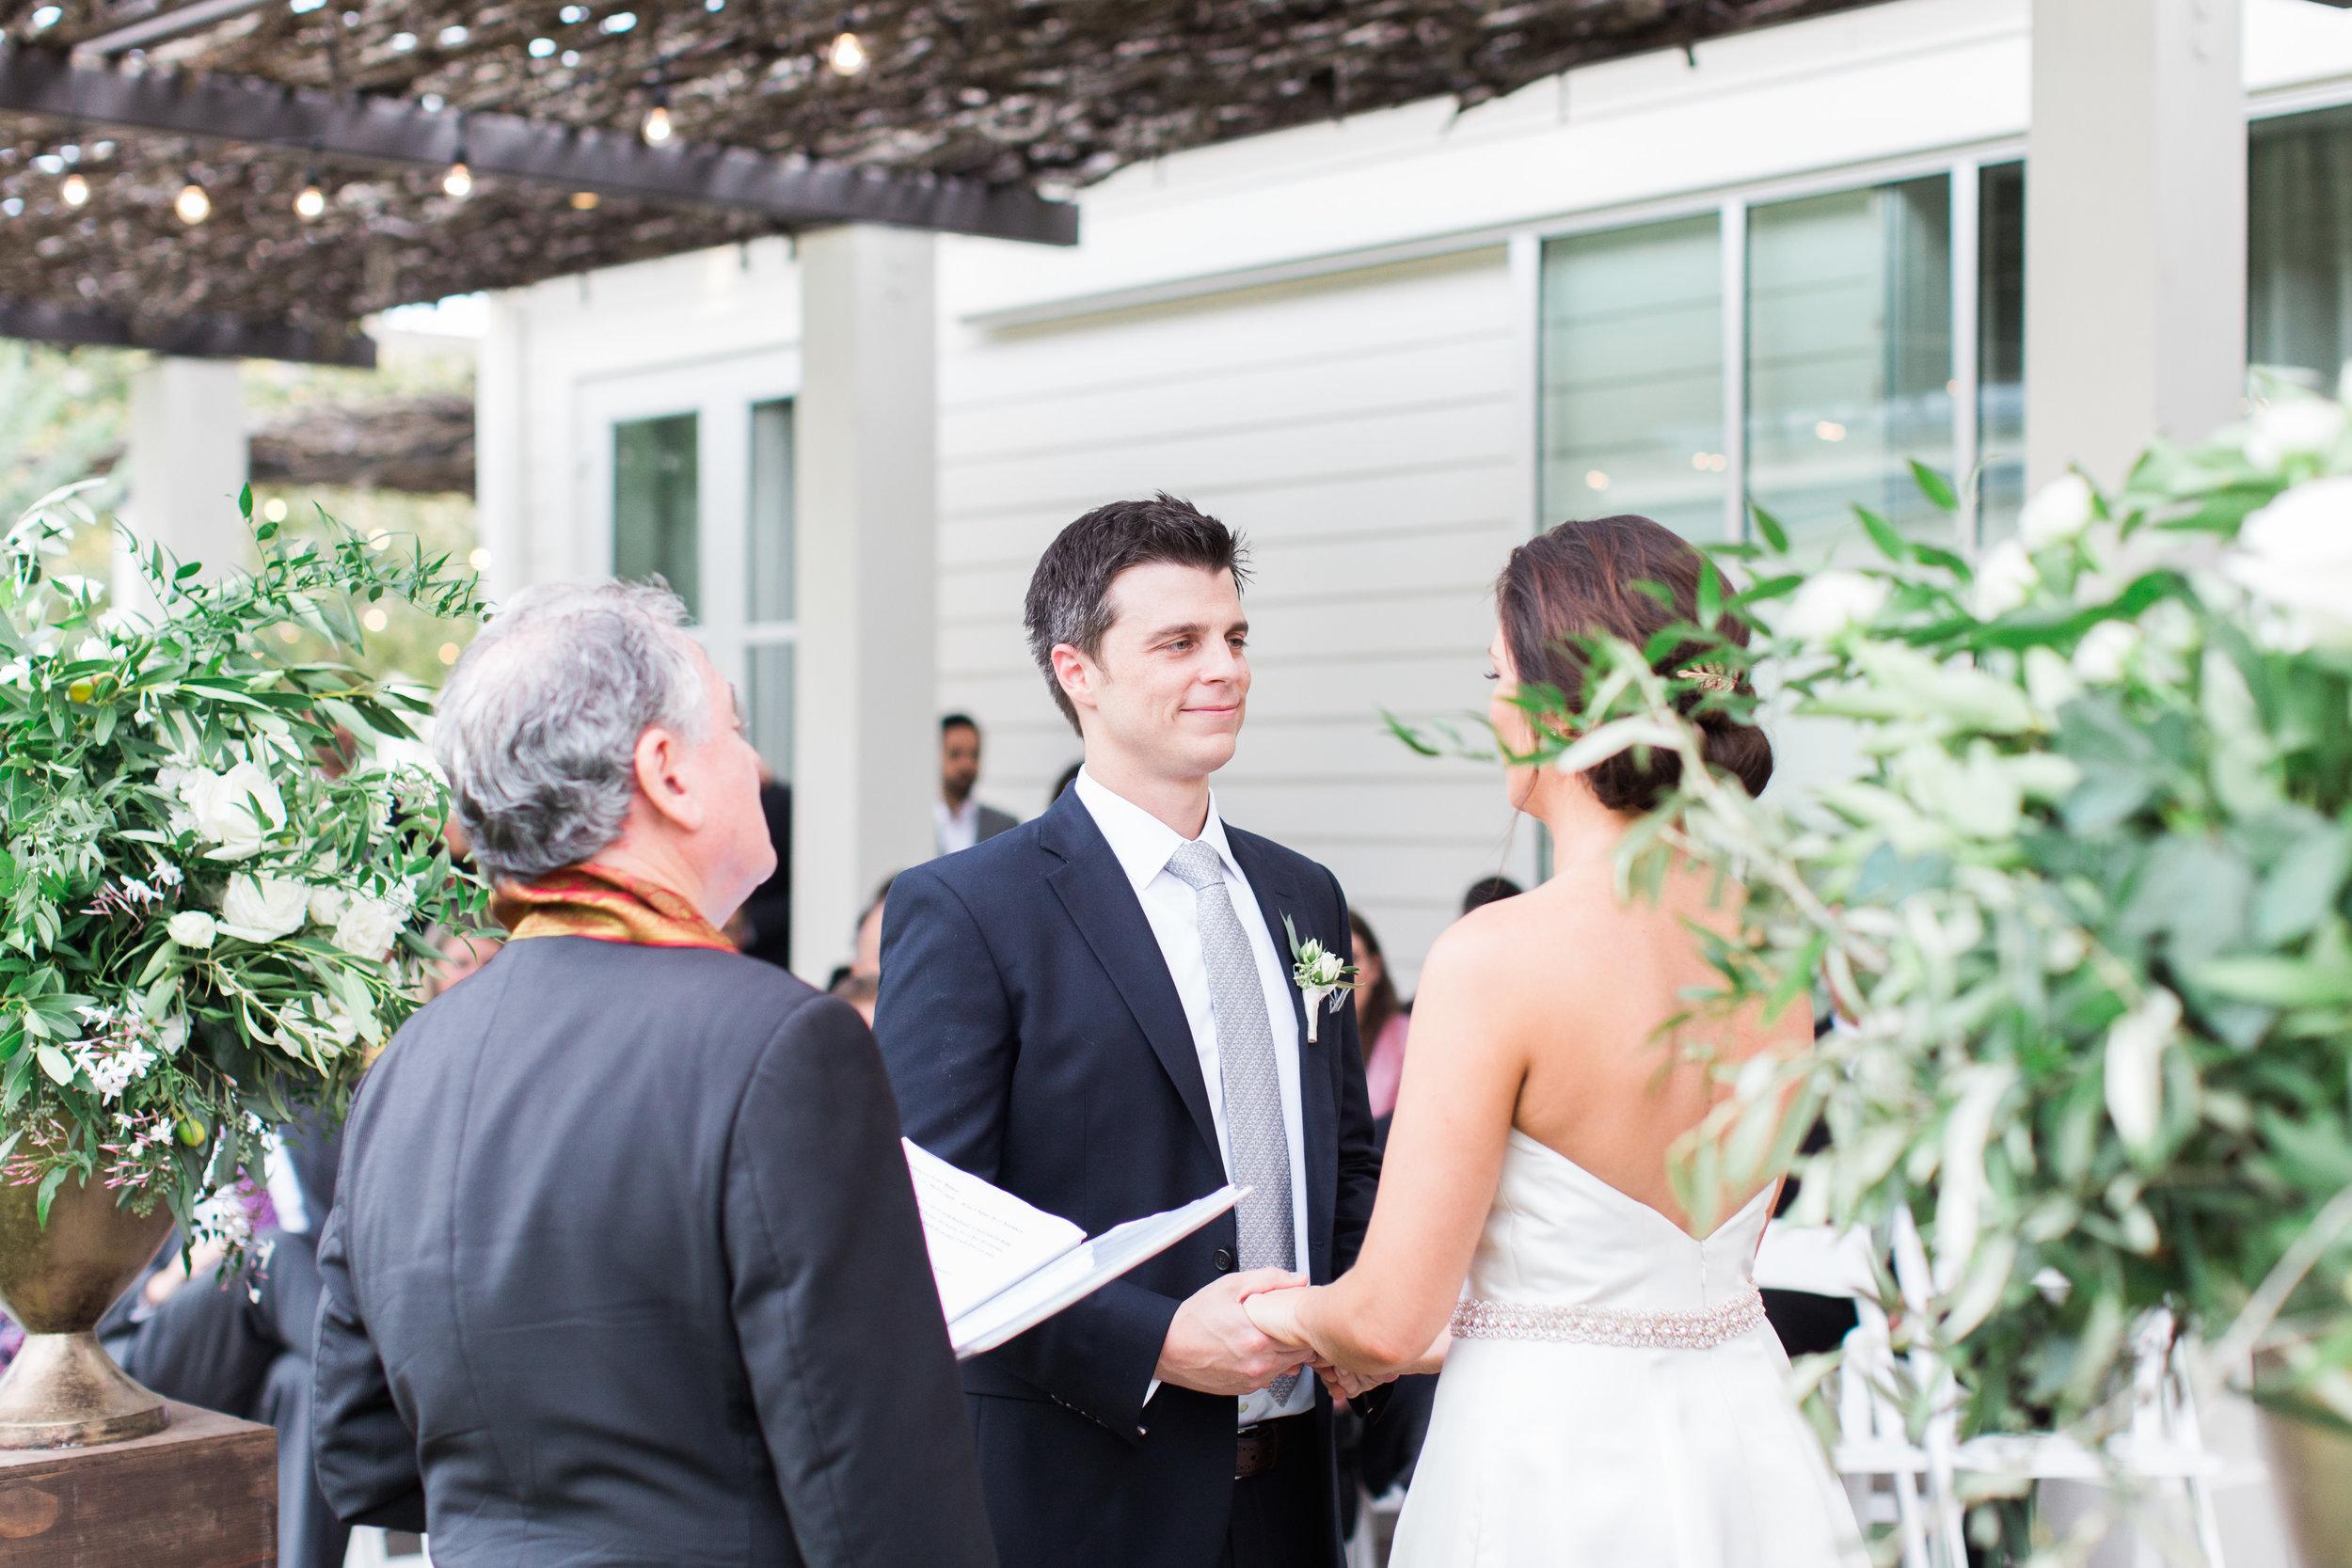 intimate-wedding-at-solage-calistoga-in-napa-70.jpg